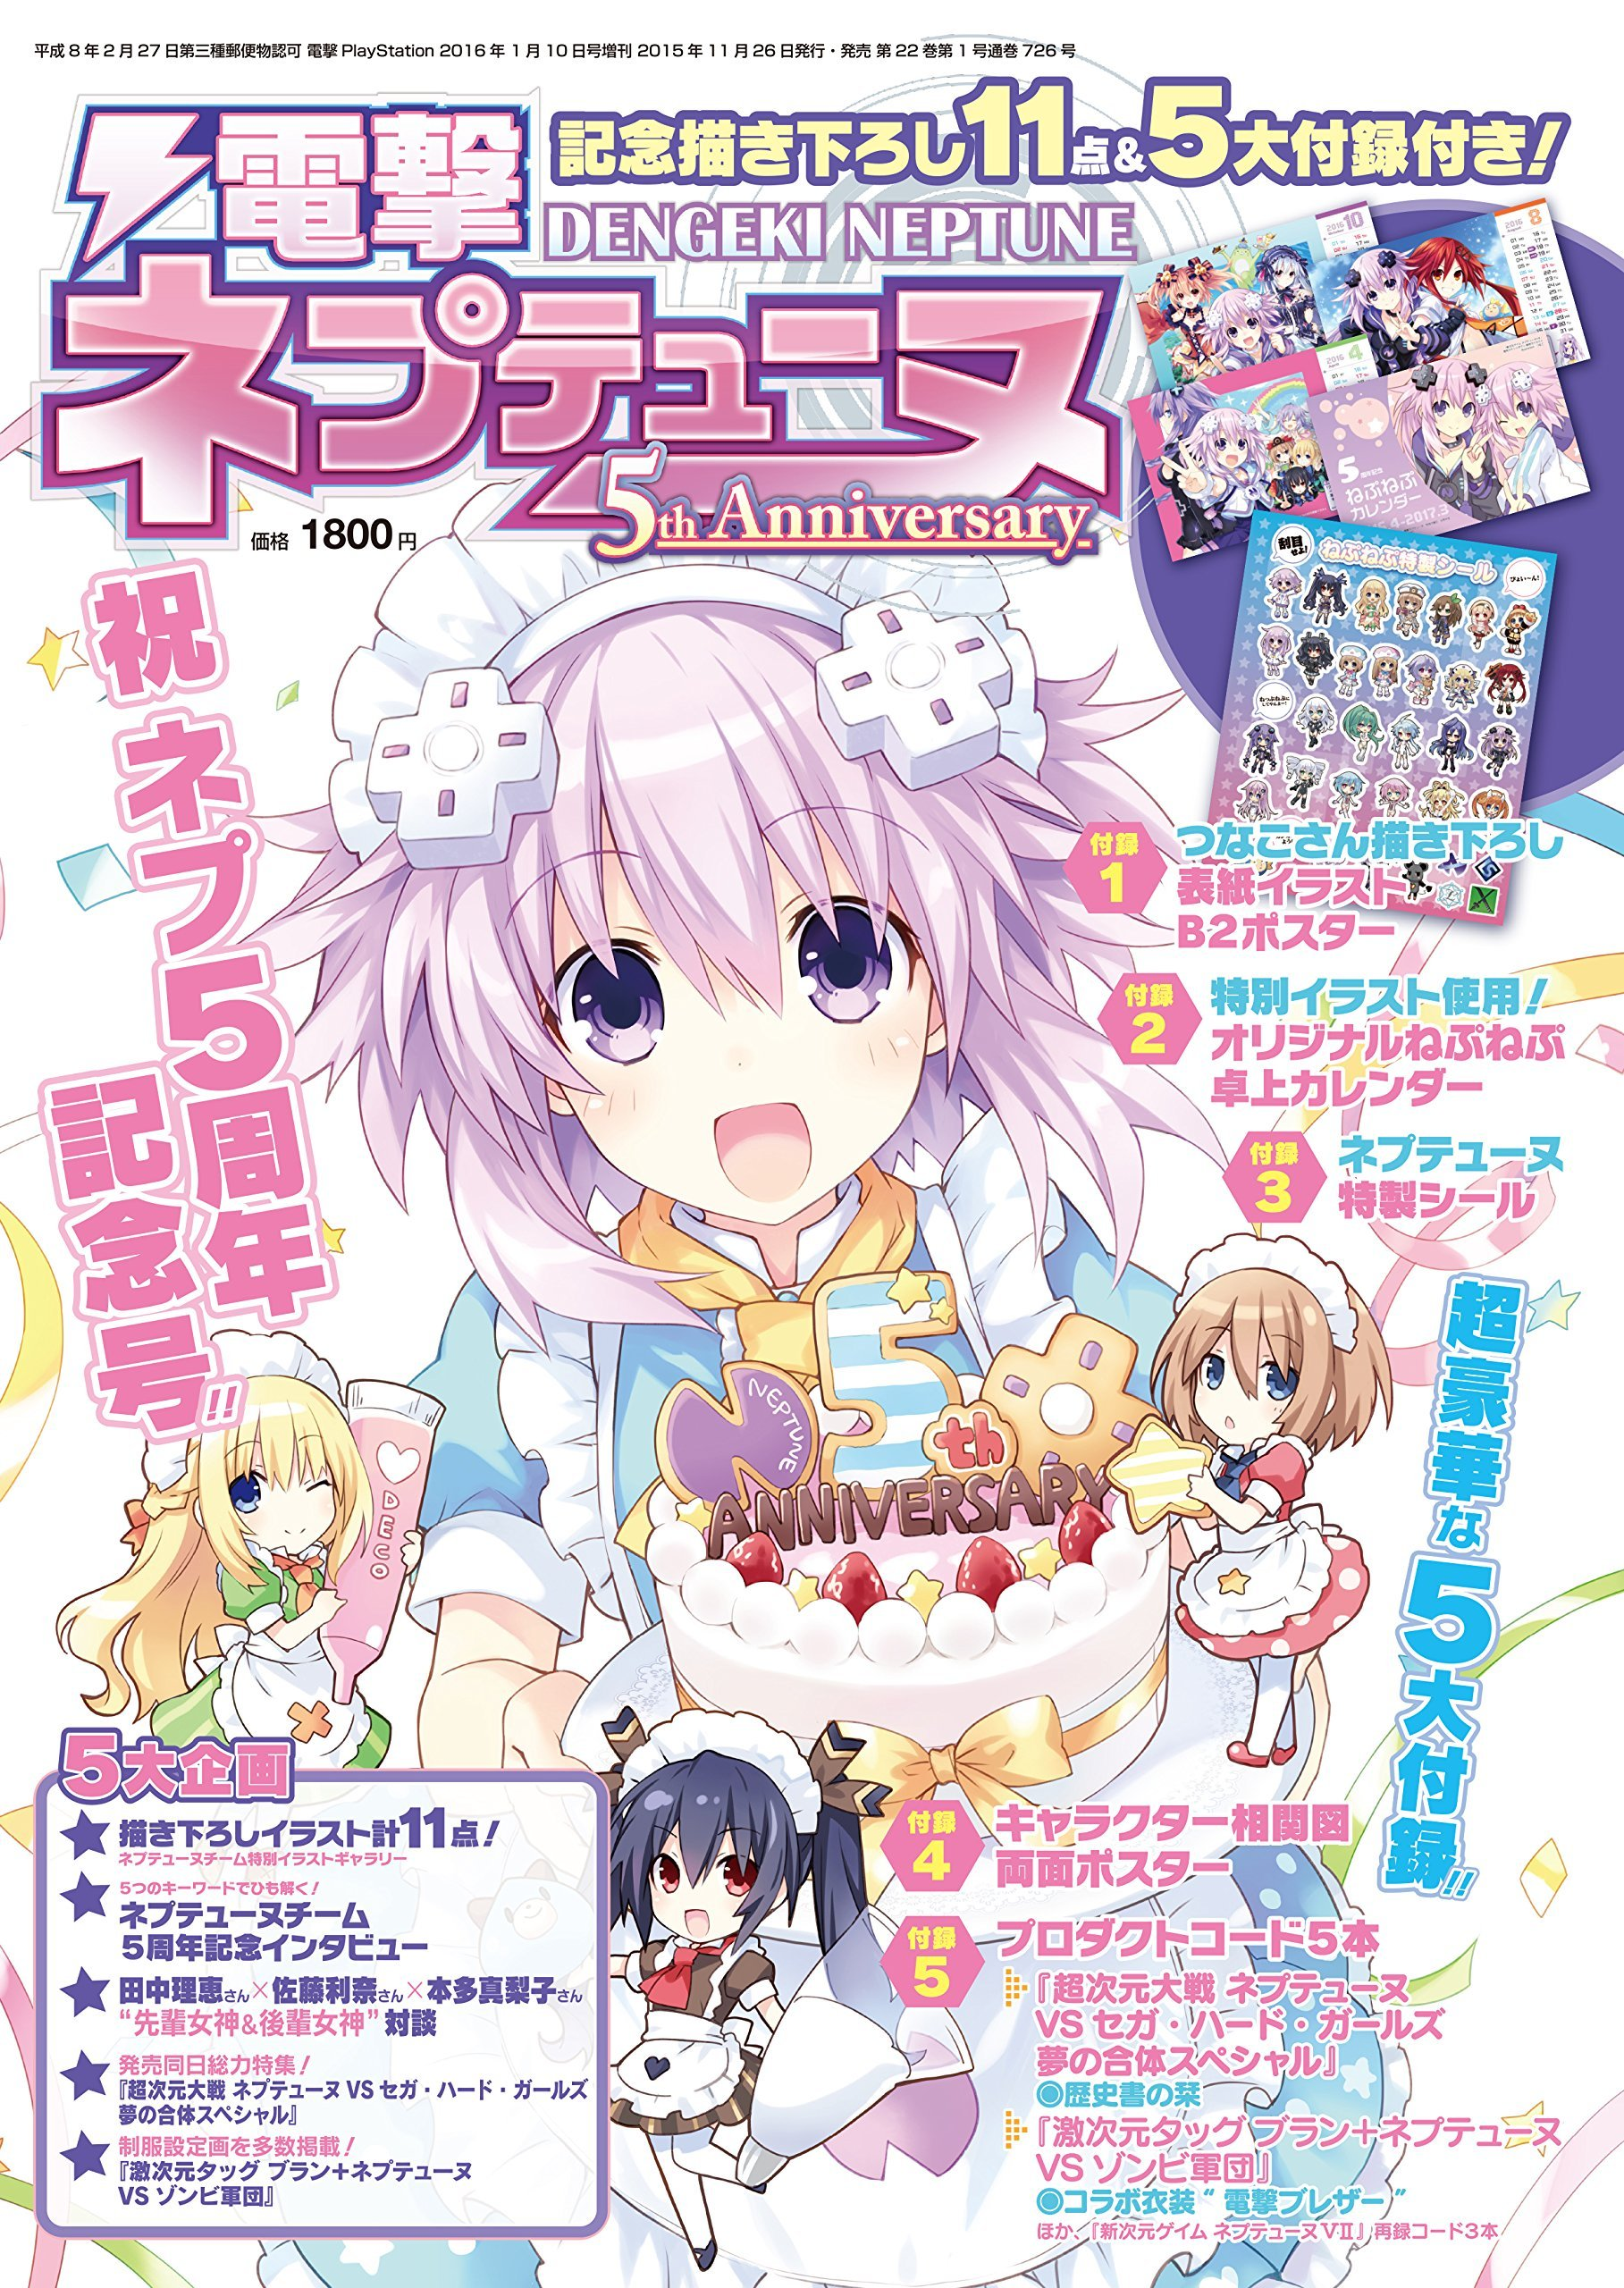 Dengeki Neptune Vol.1 (January 10, 2016)